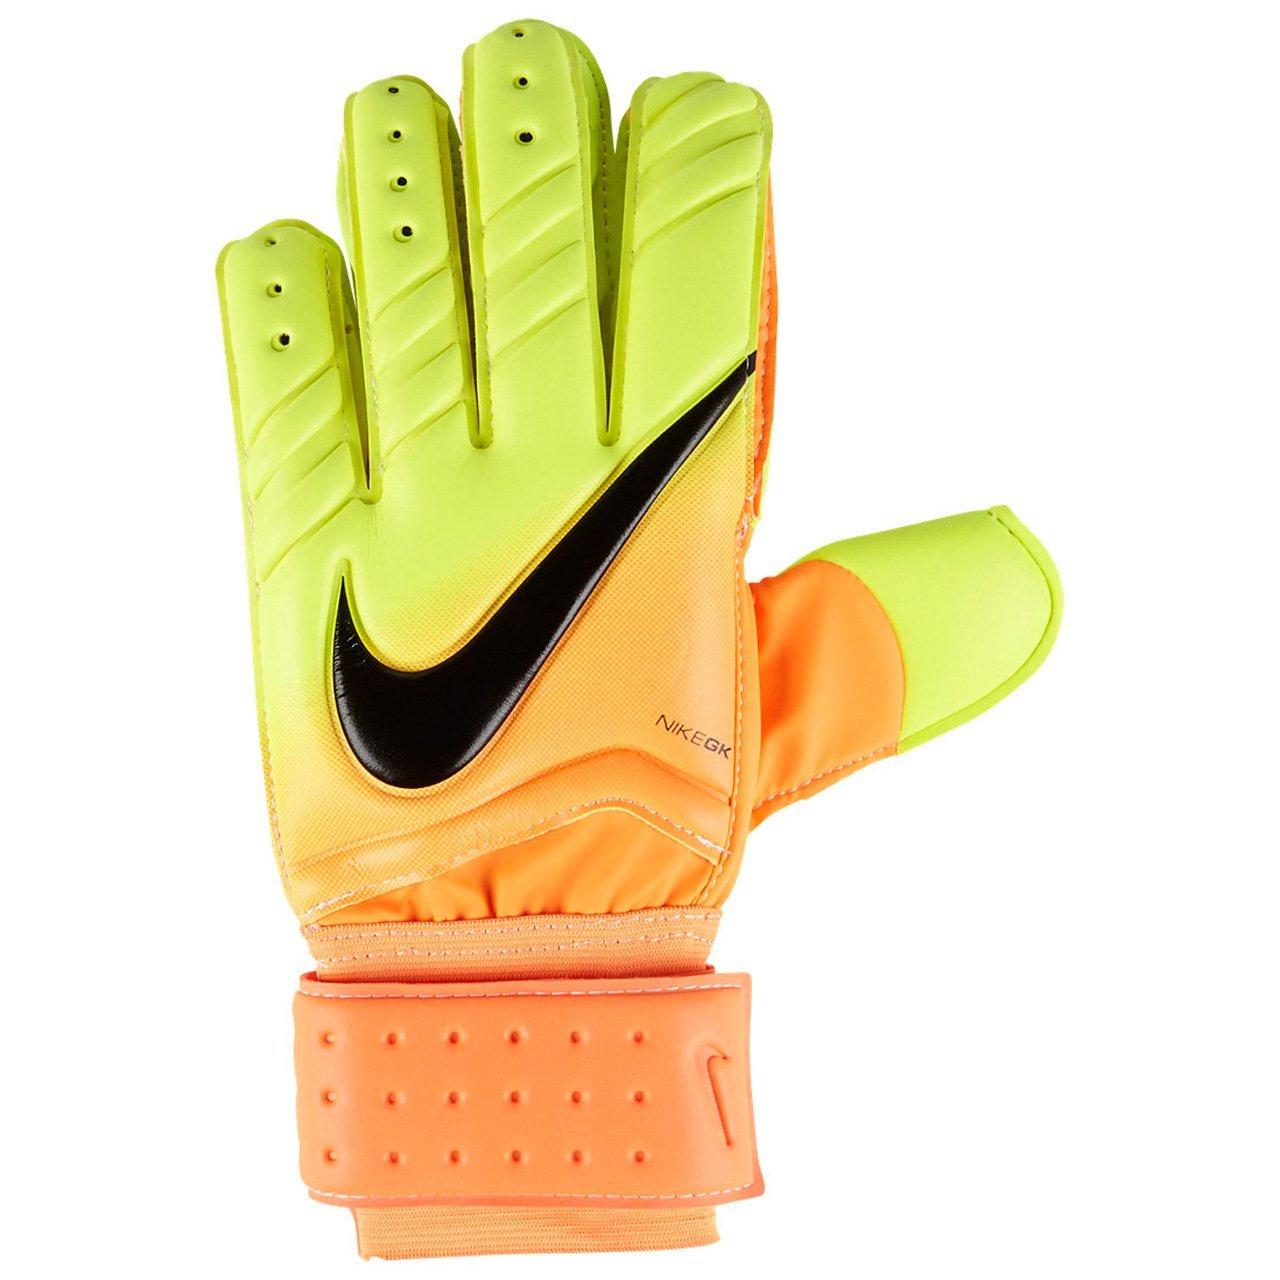 Get Quotations · Nike Goalkeep Spyne Pro Football Glove [BRIGHT CITRUS]